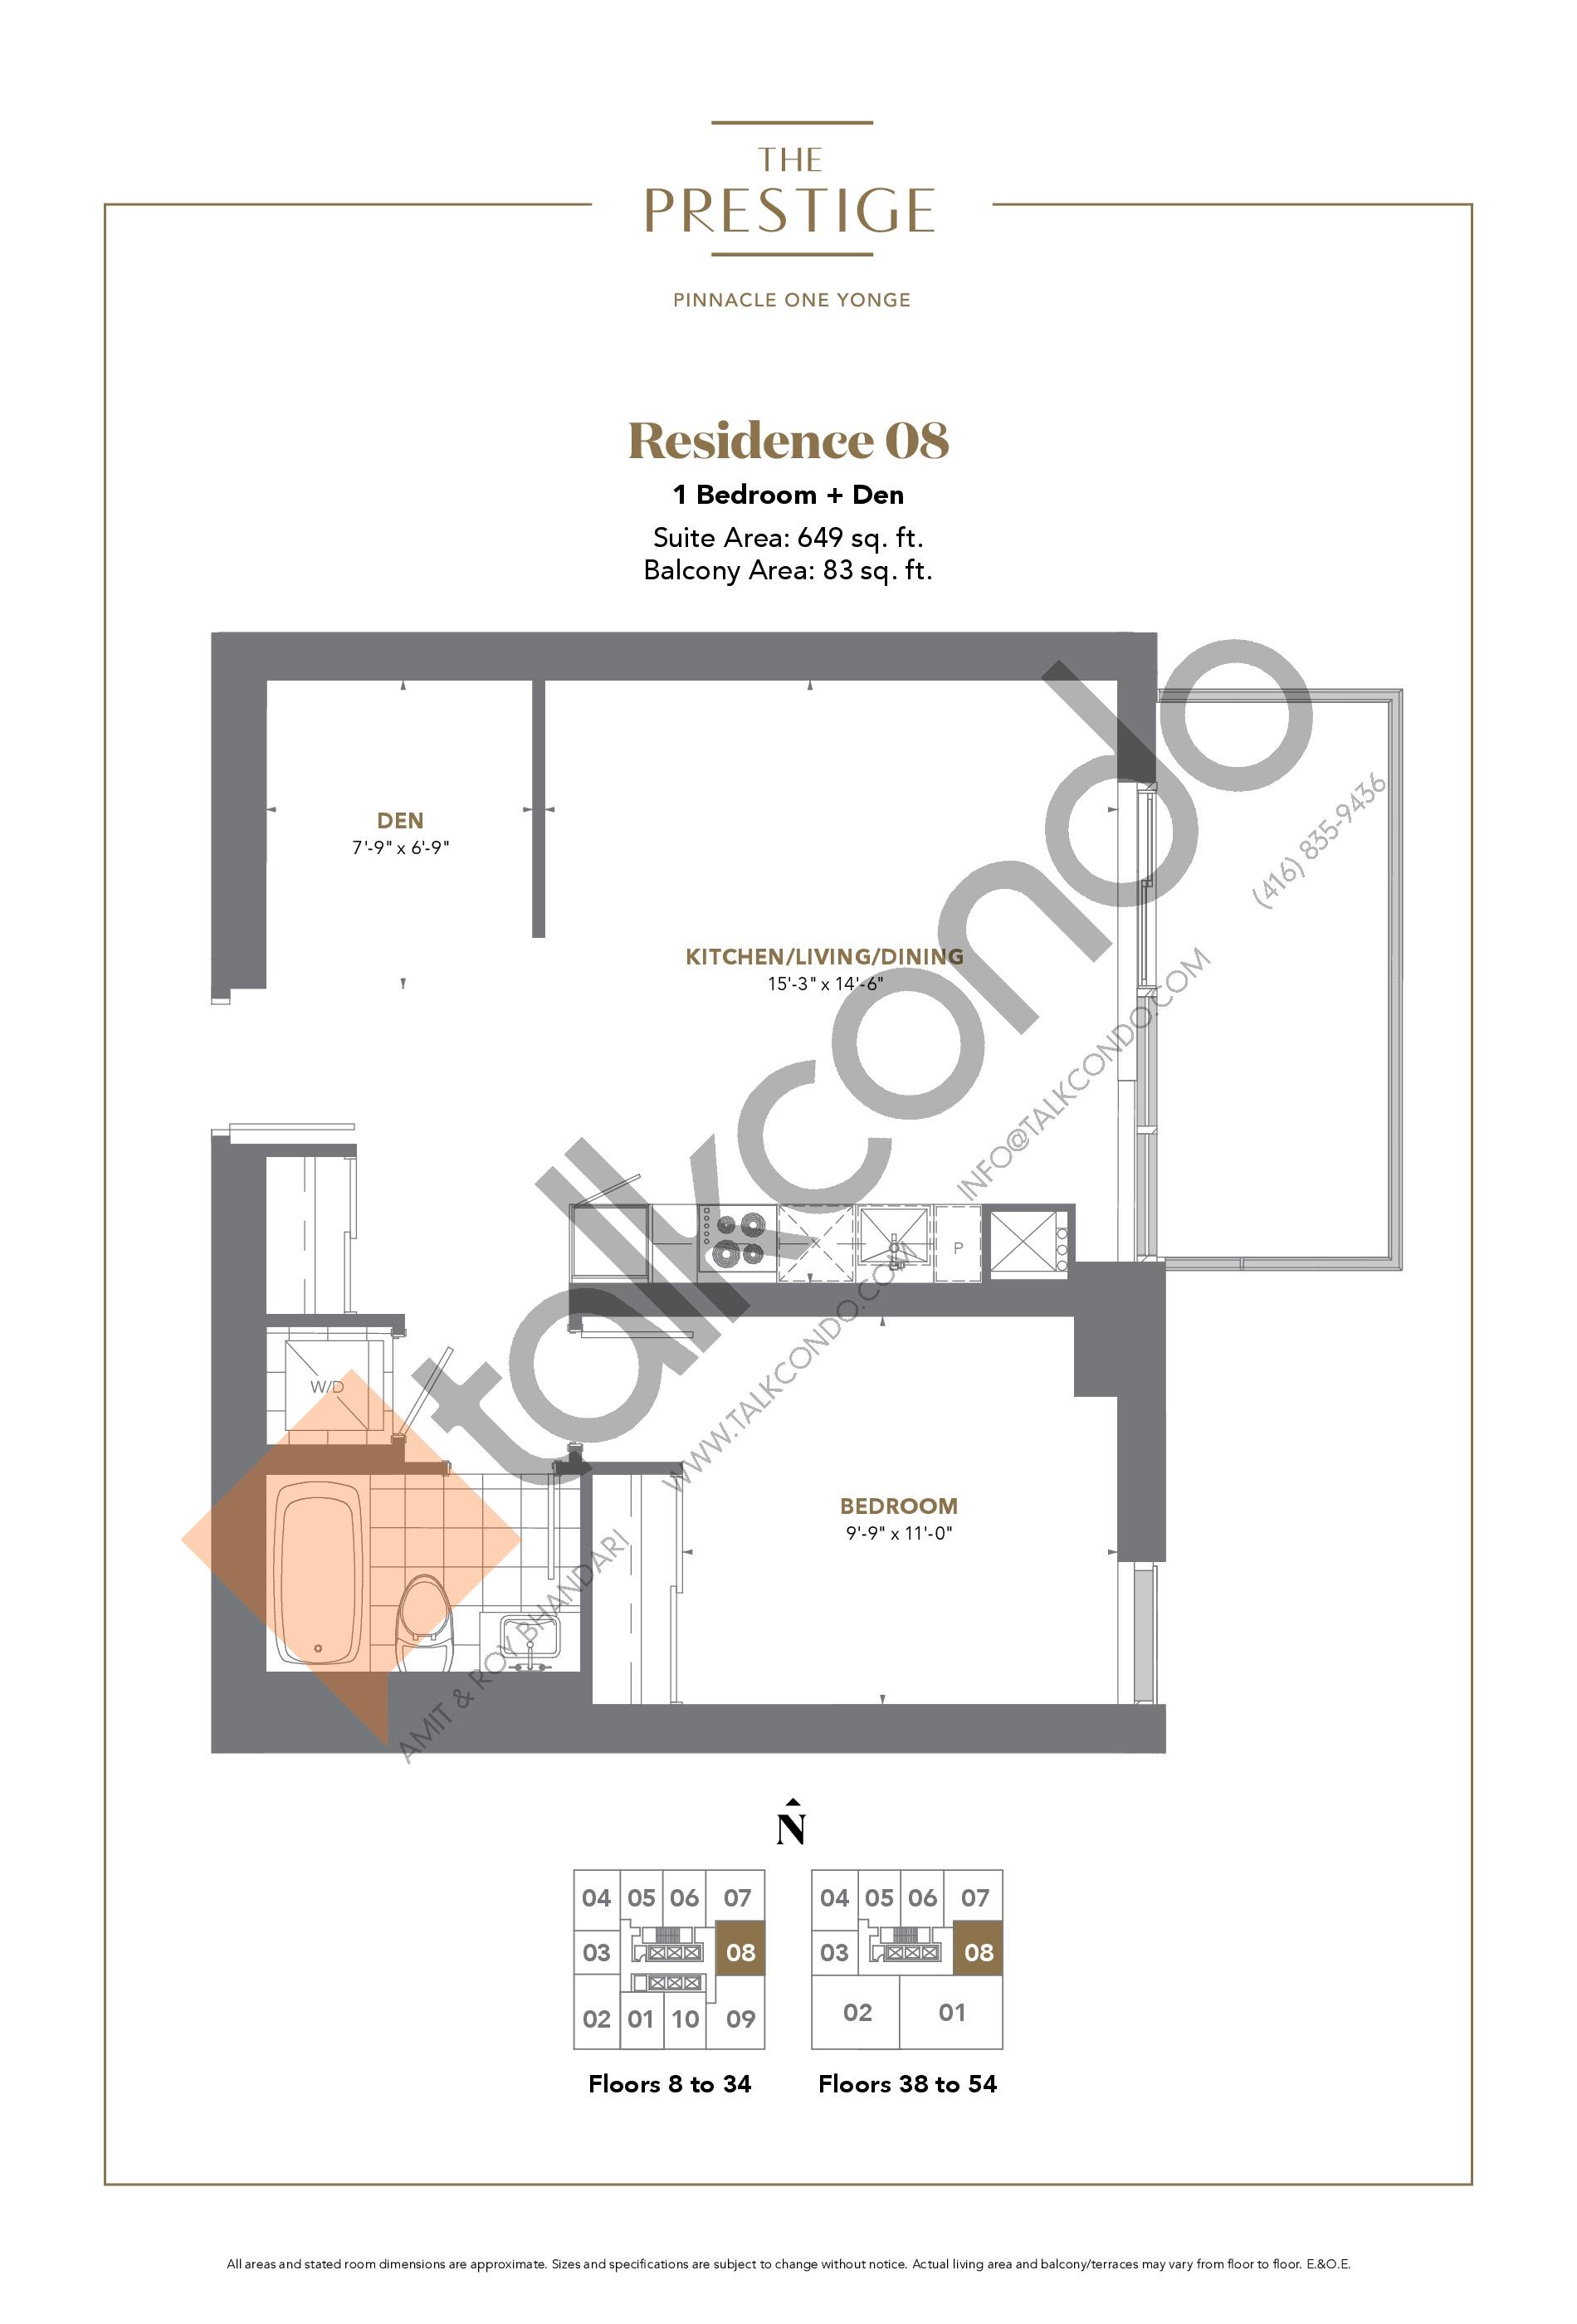 Residence 08 Floor Plan at The Prestige Condos at Pinnacle One Yonge - 649 sq.ft